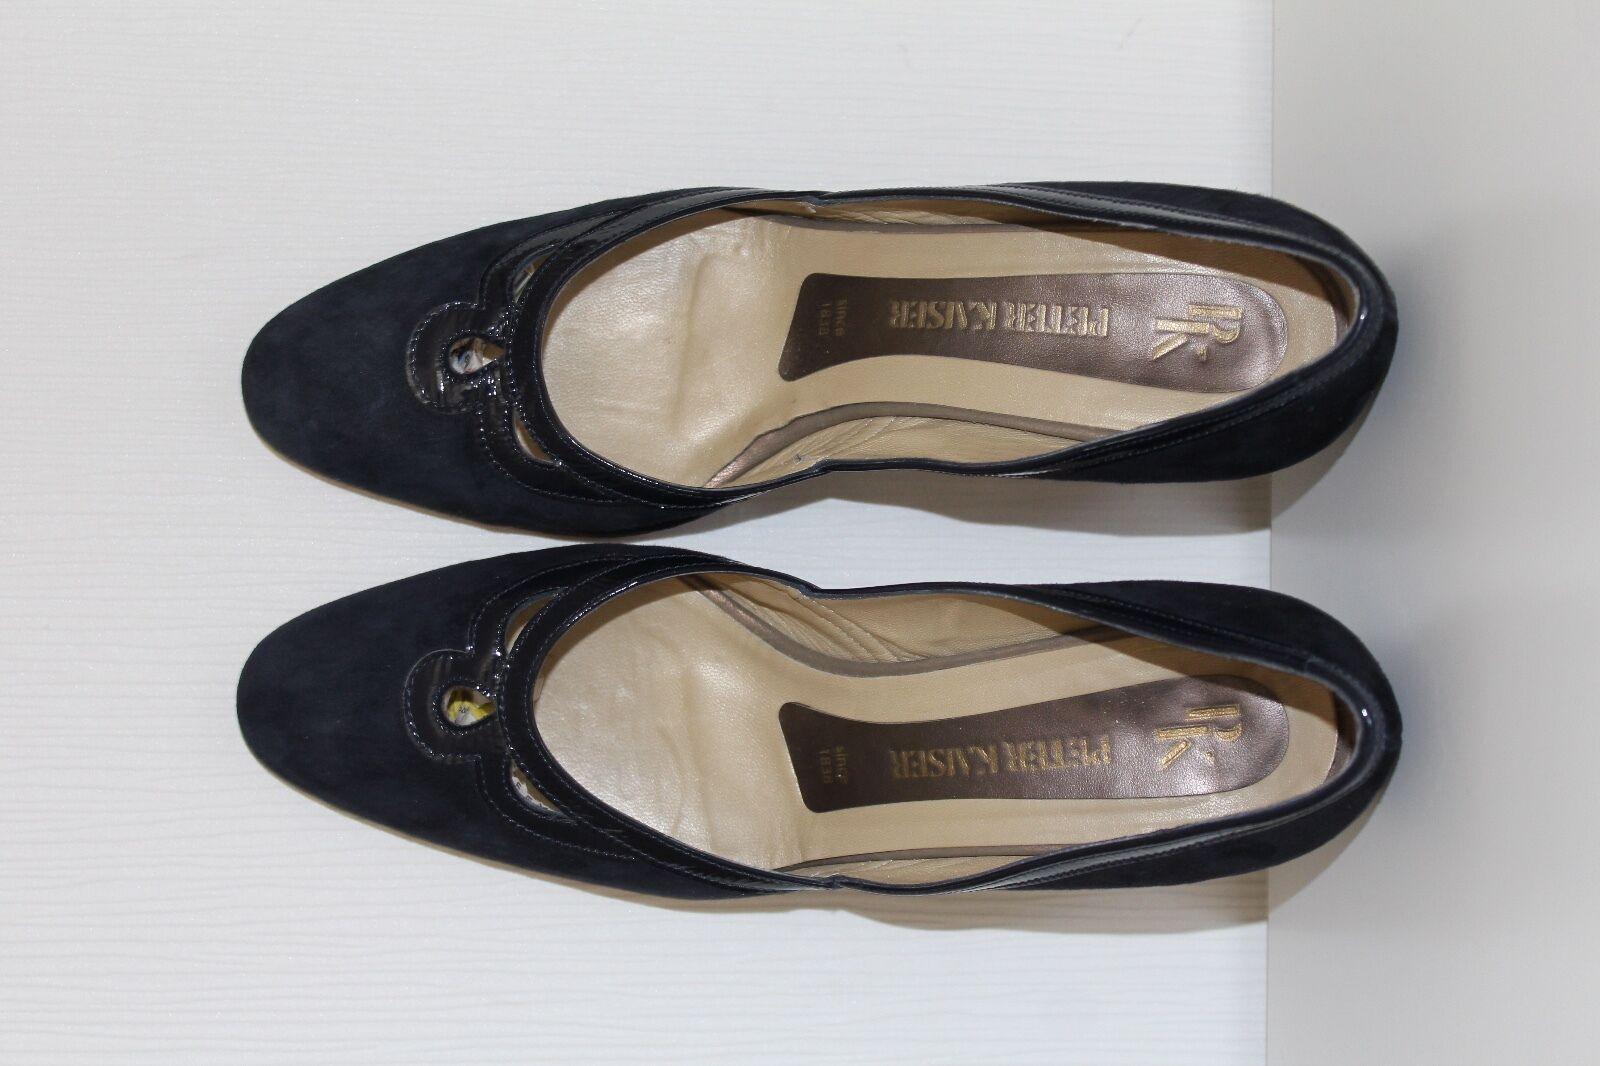 Peter Kaiser Damen SCHUHE PUMPS Größe 37 Wildleder Echtleder leather SHOES HEELS